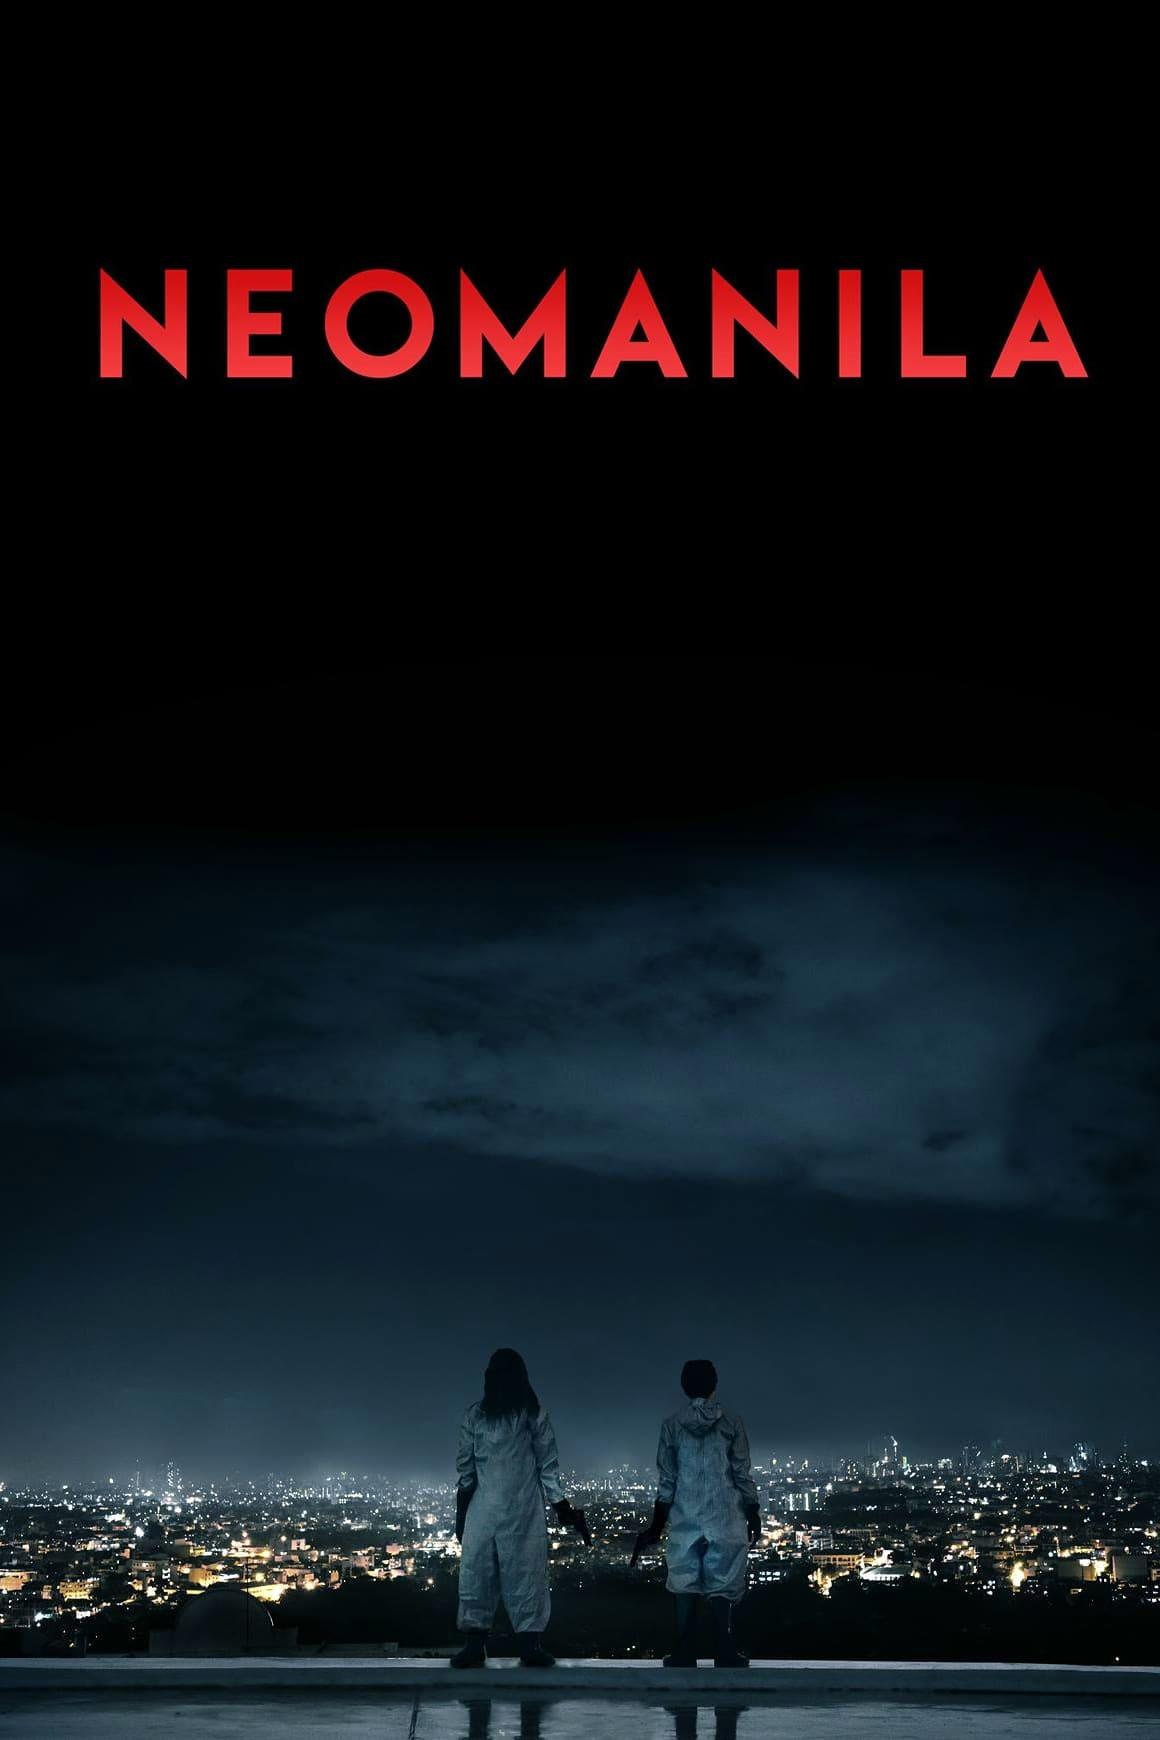 Neomanila